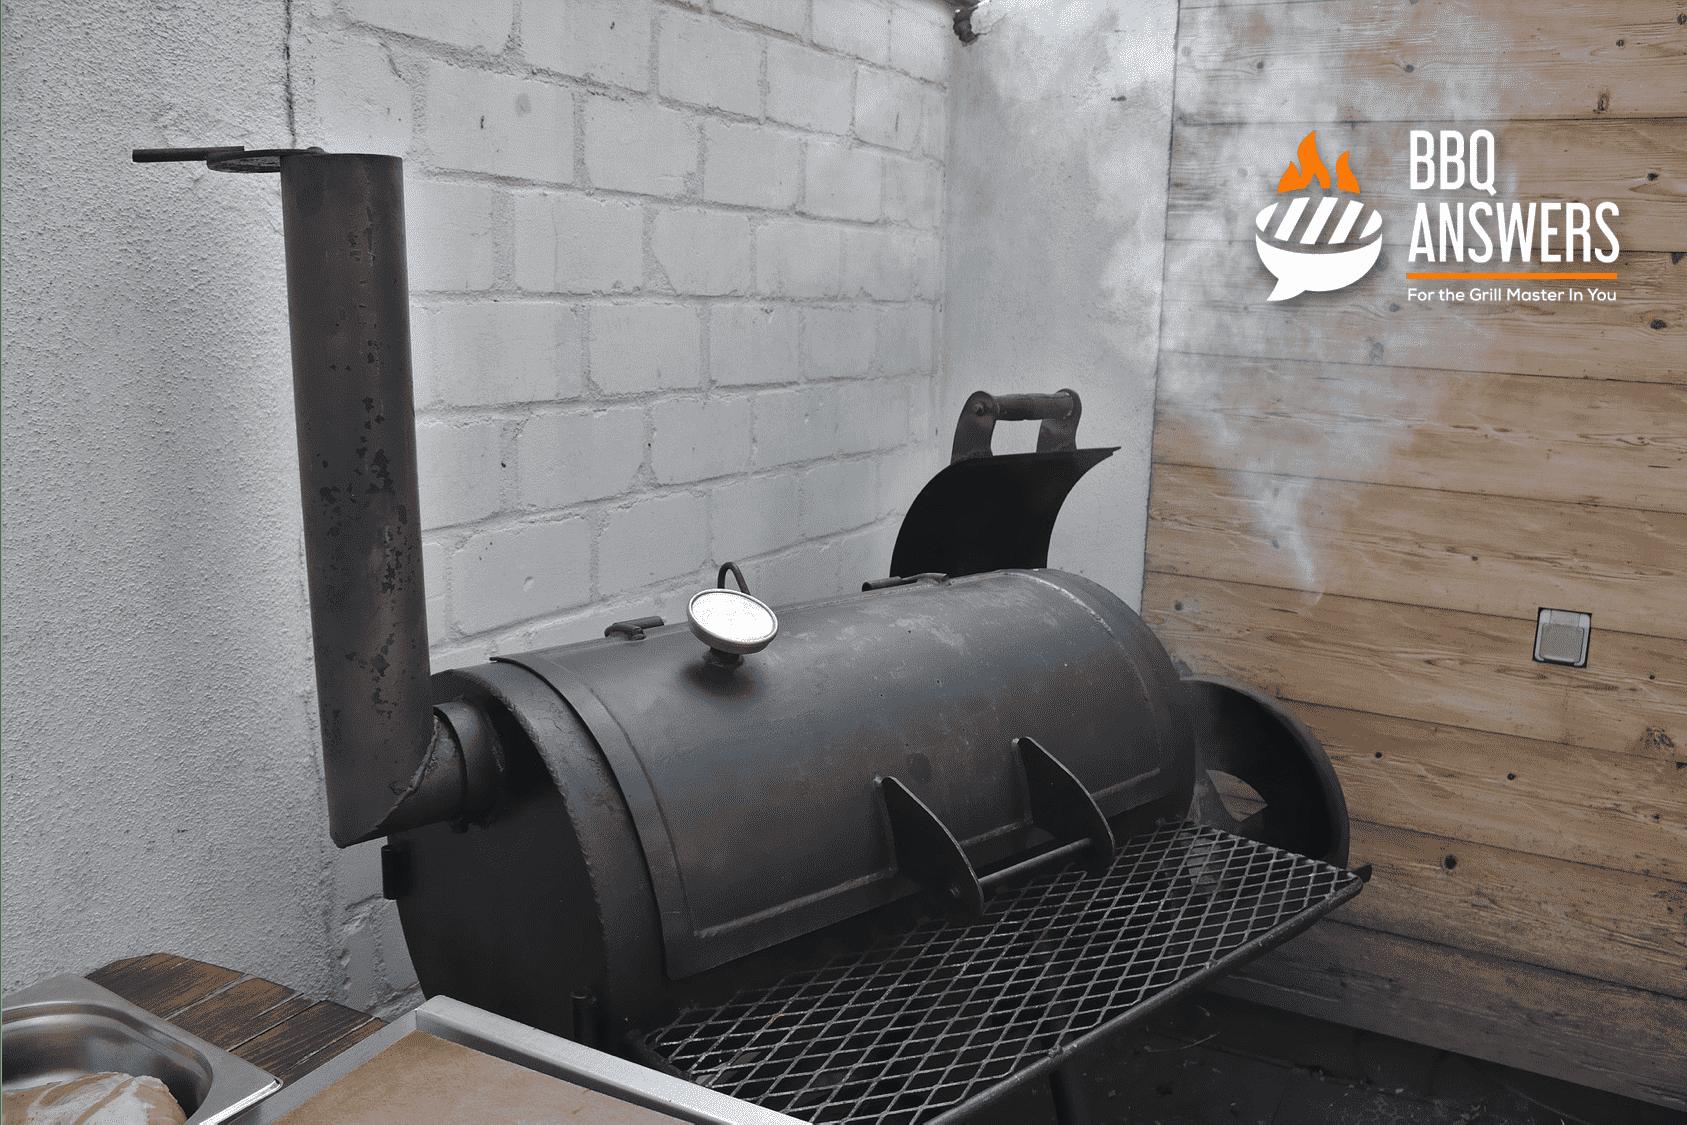 BBQ Smokers Buyers Guide   BBQanswers